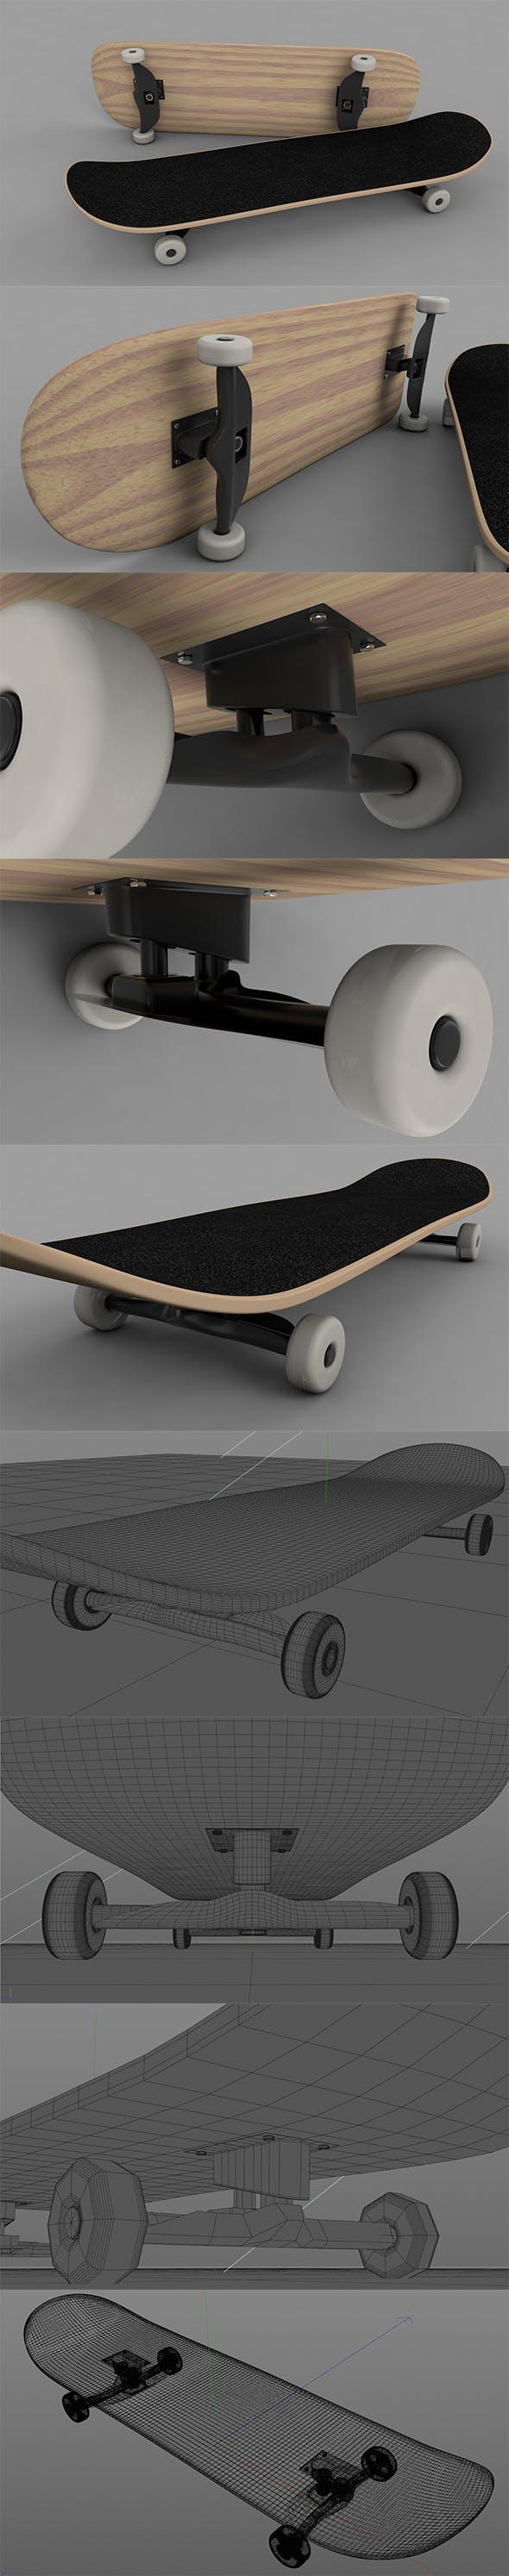 3D Skateboard - 3DOcean Item for Sale